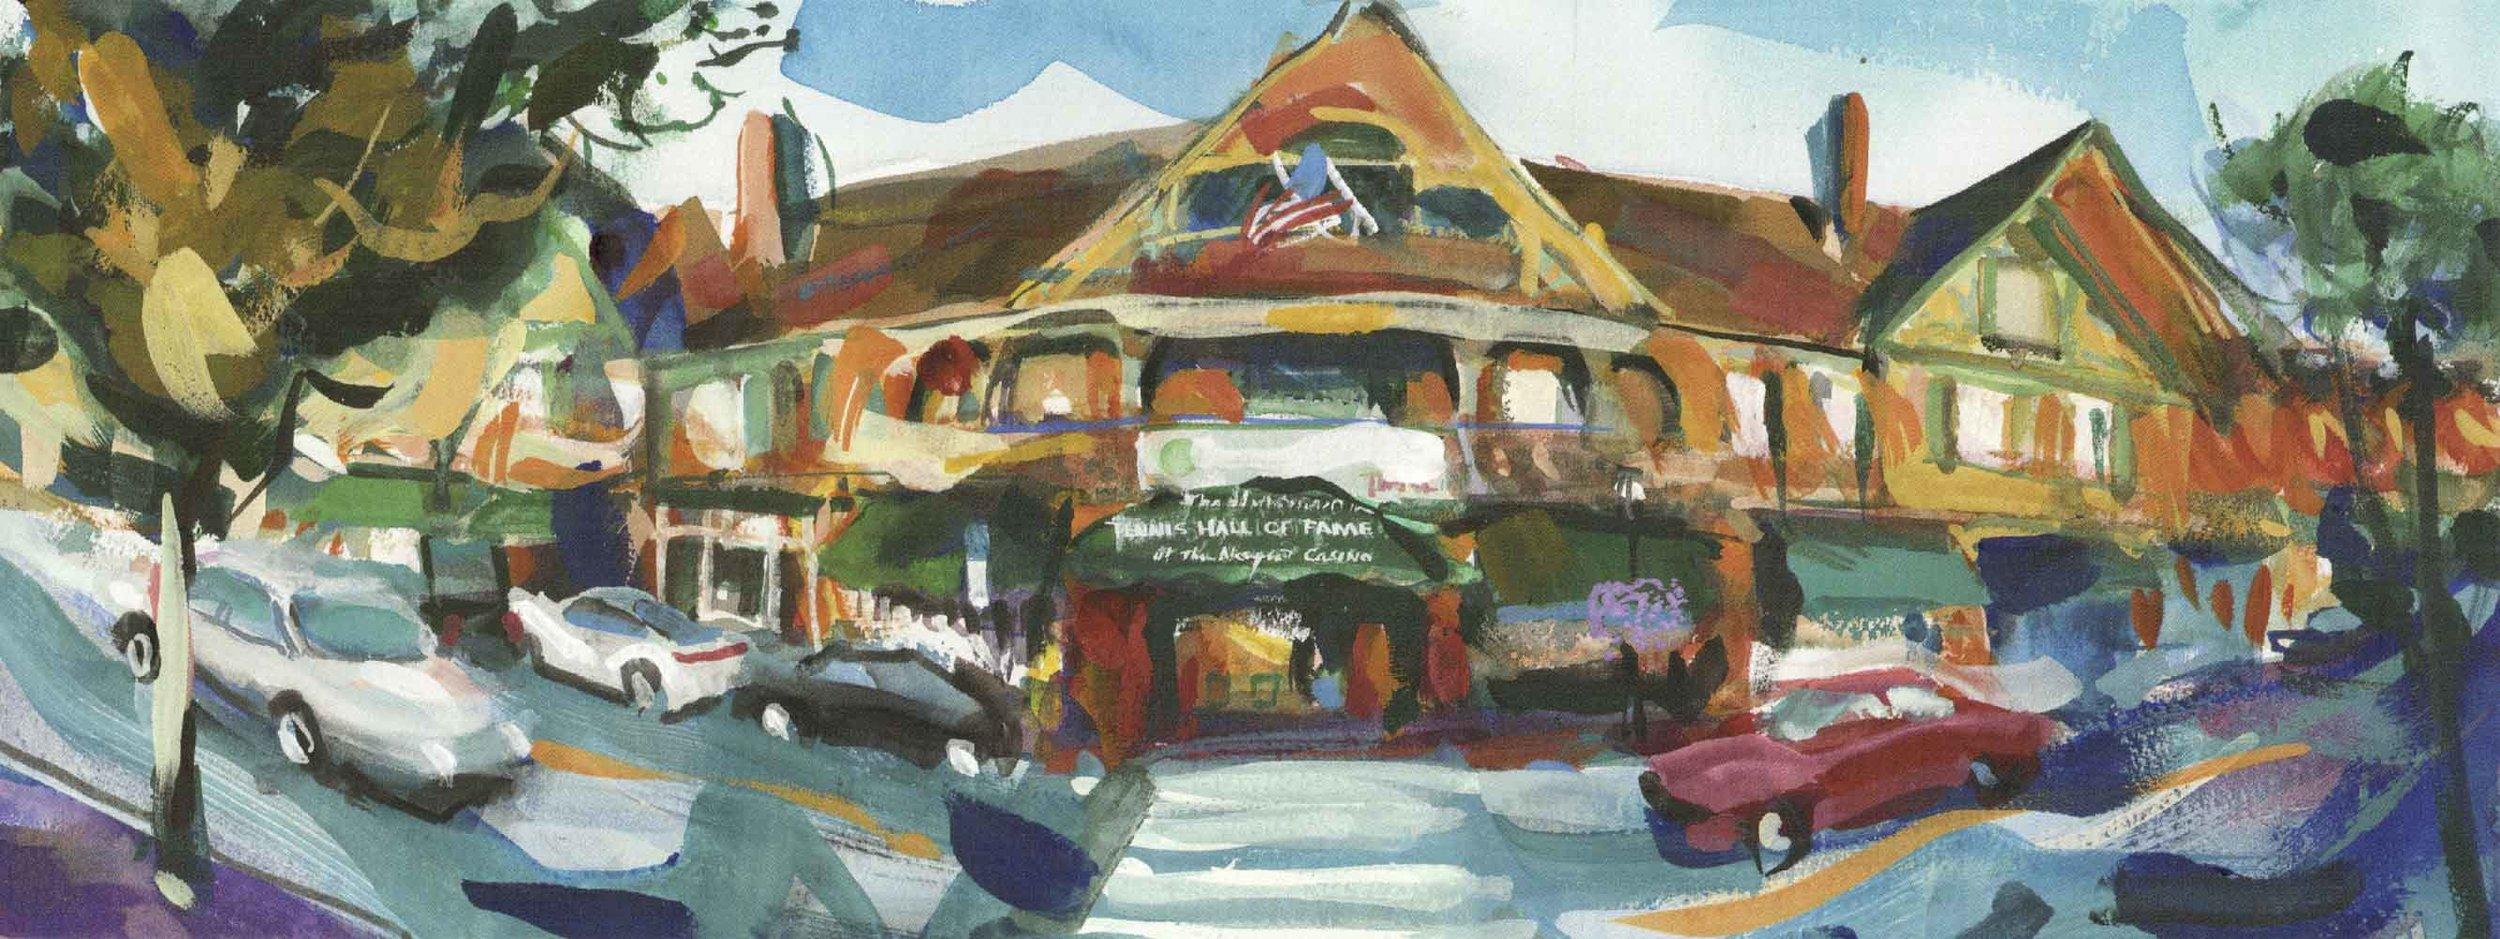 Watercolors William Heydt